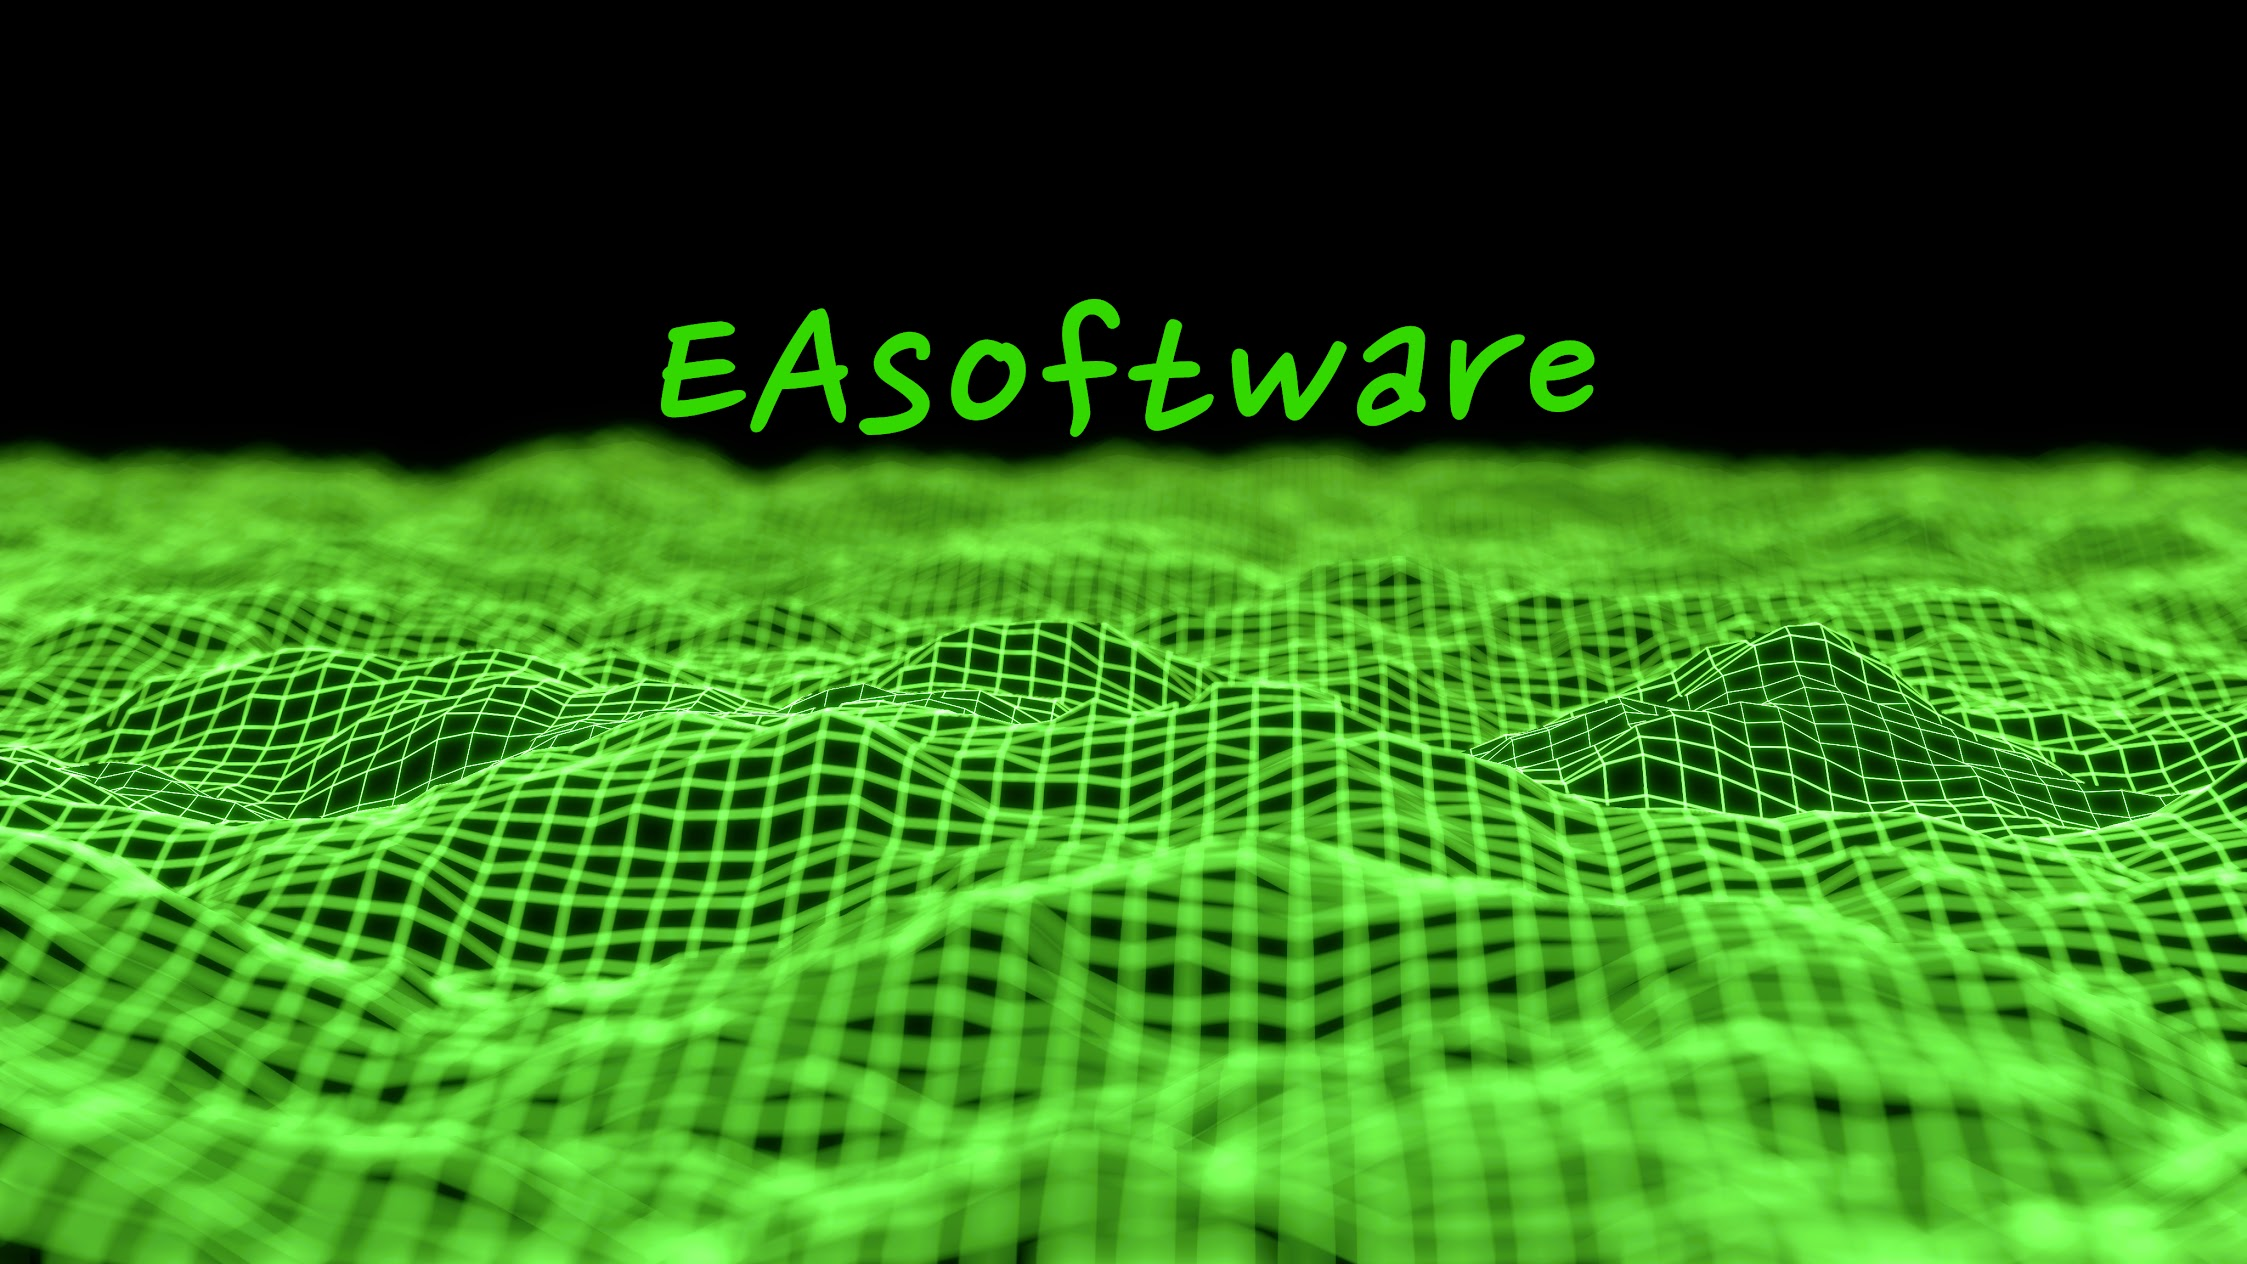 EAsoftware